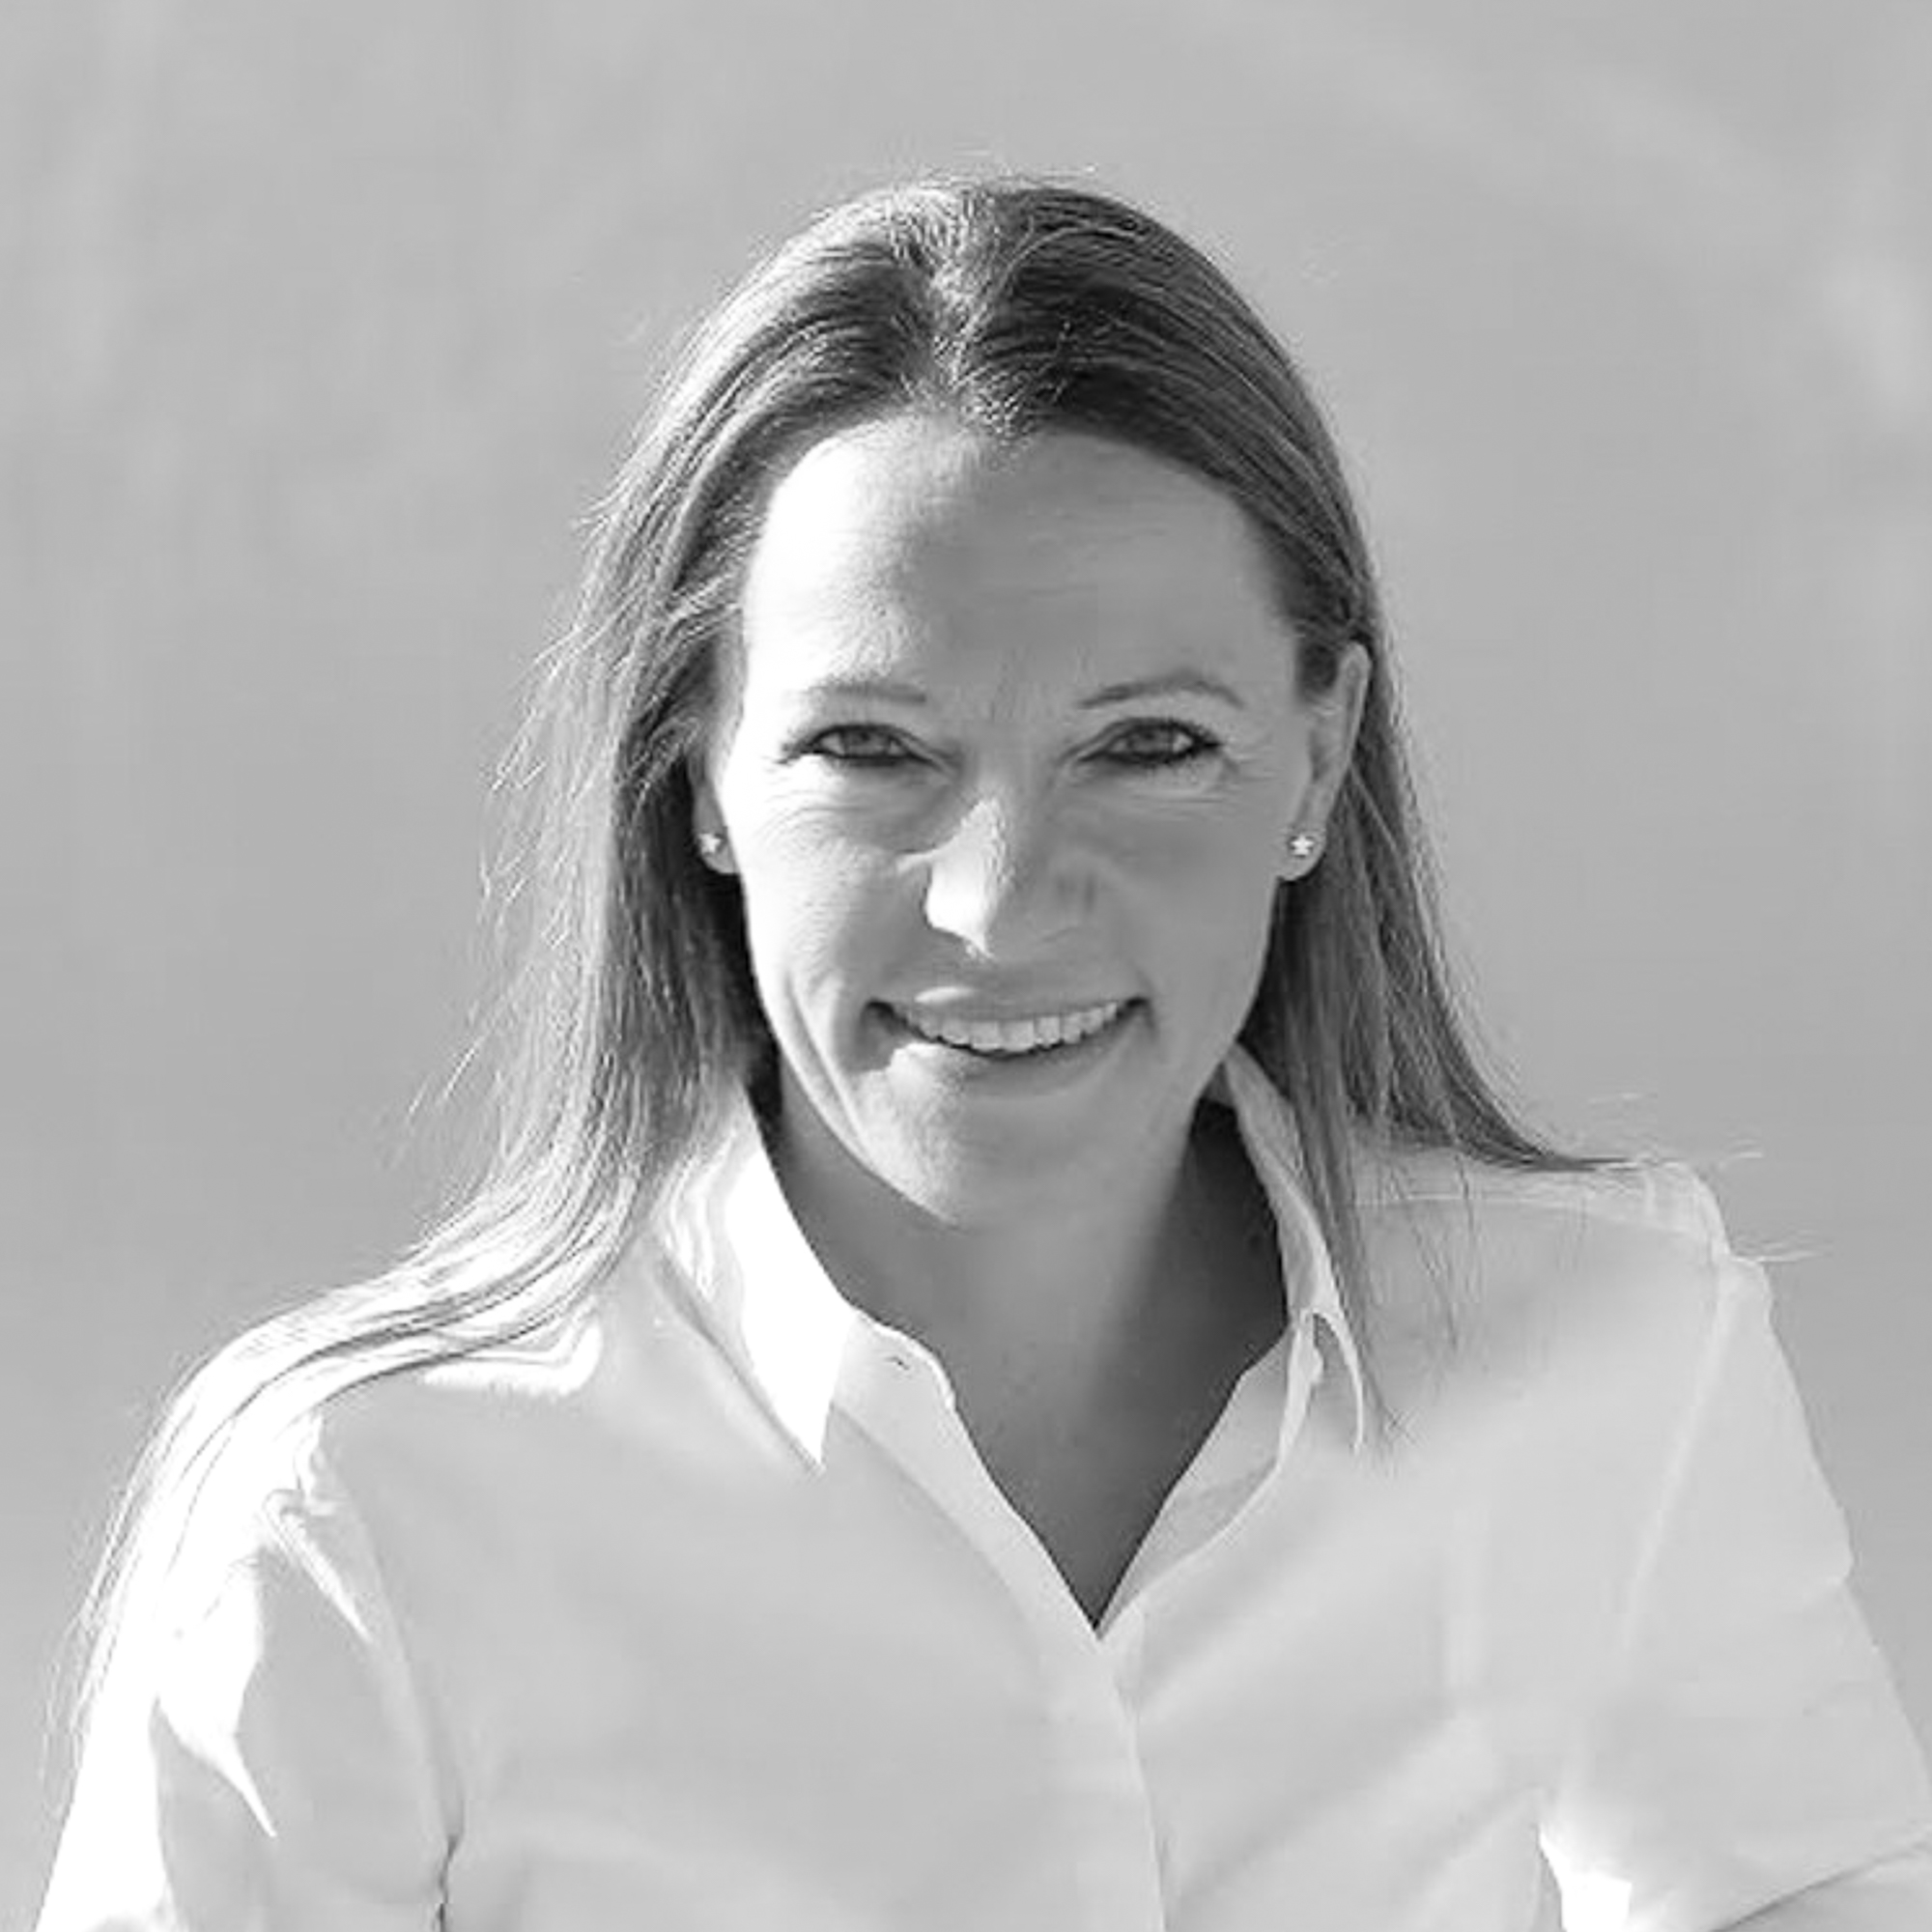 Andrea Moldenhauer